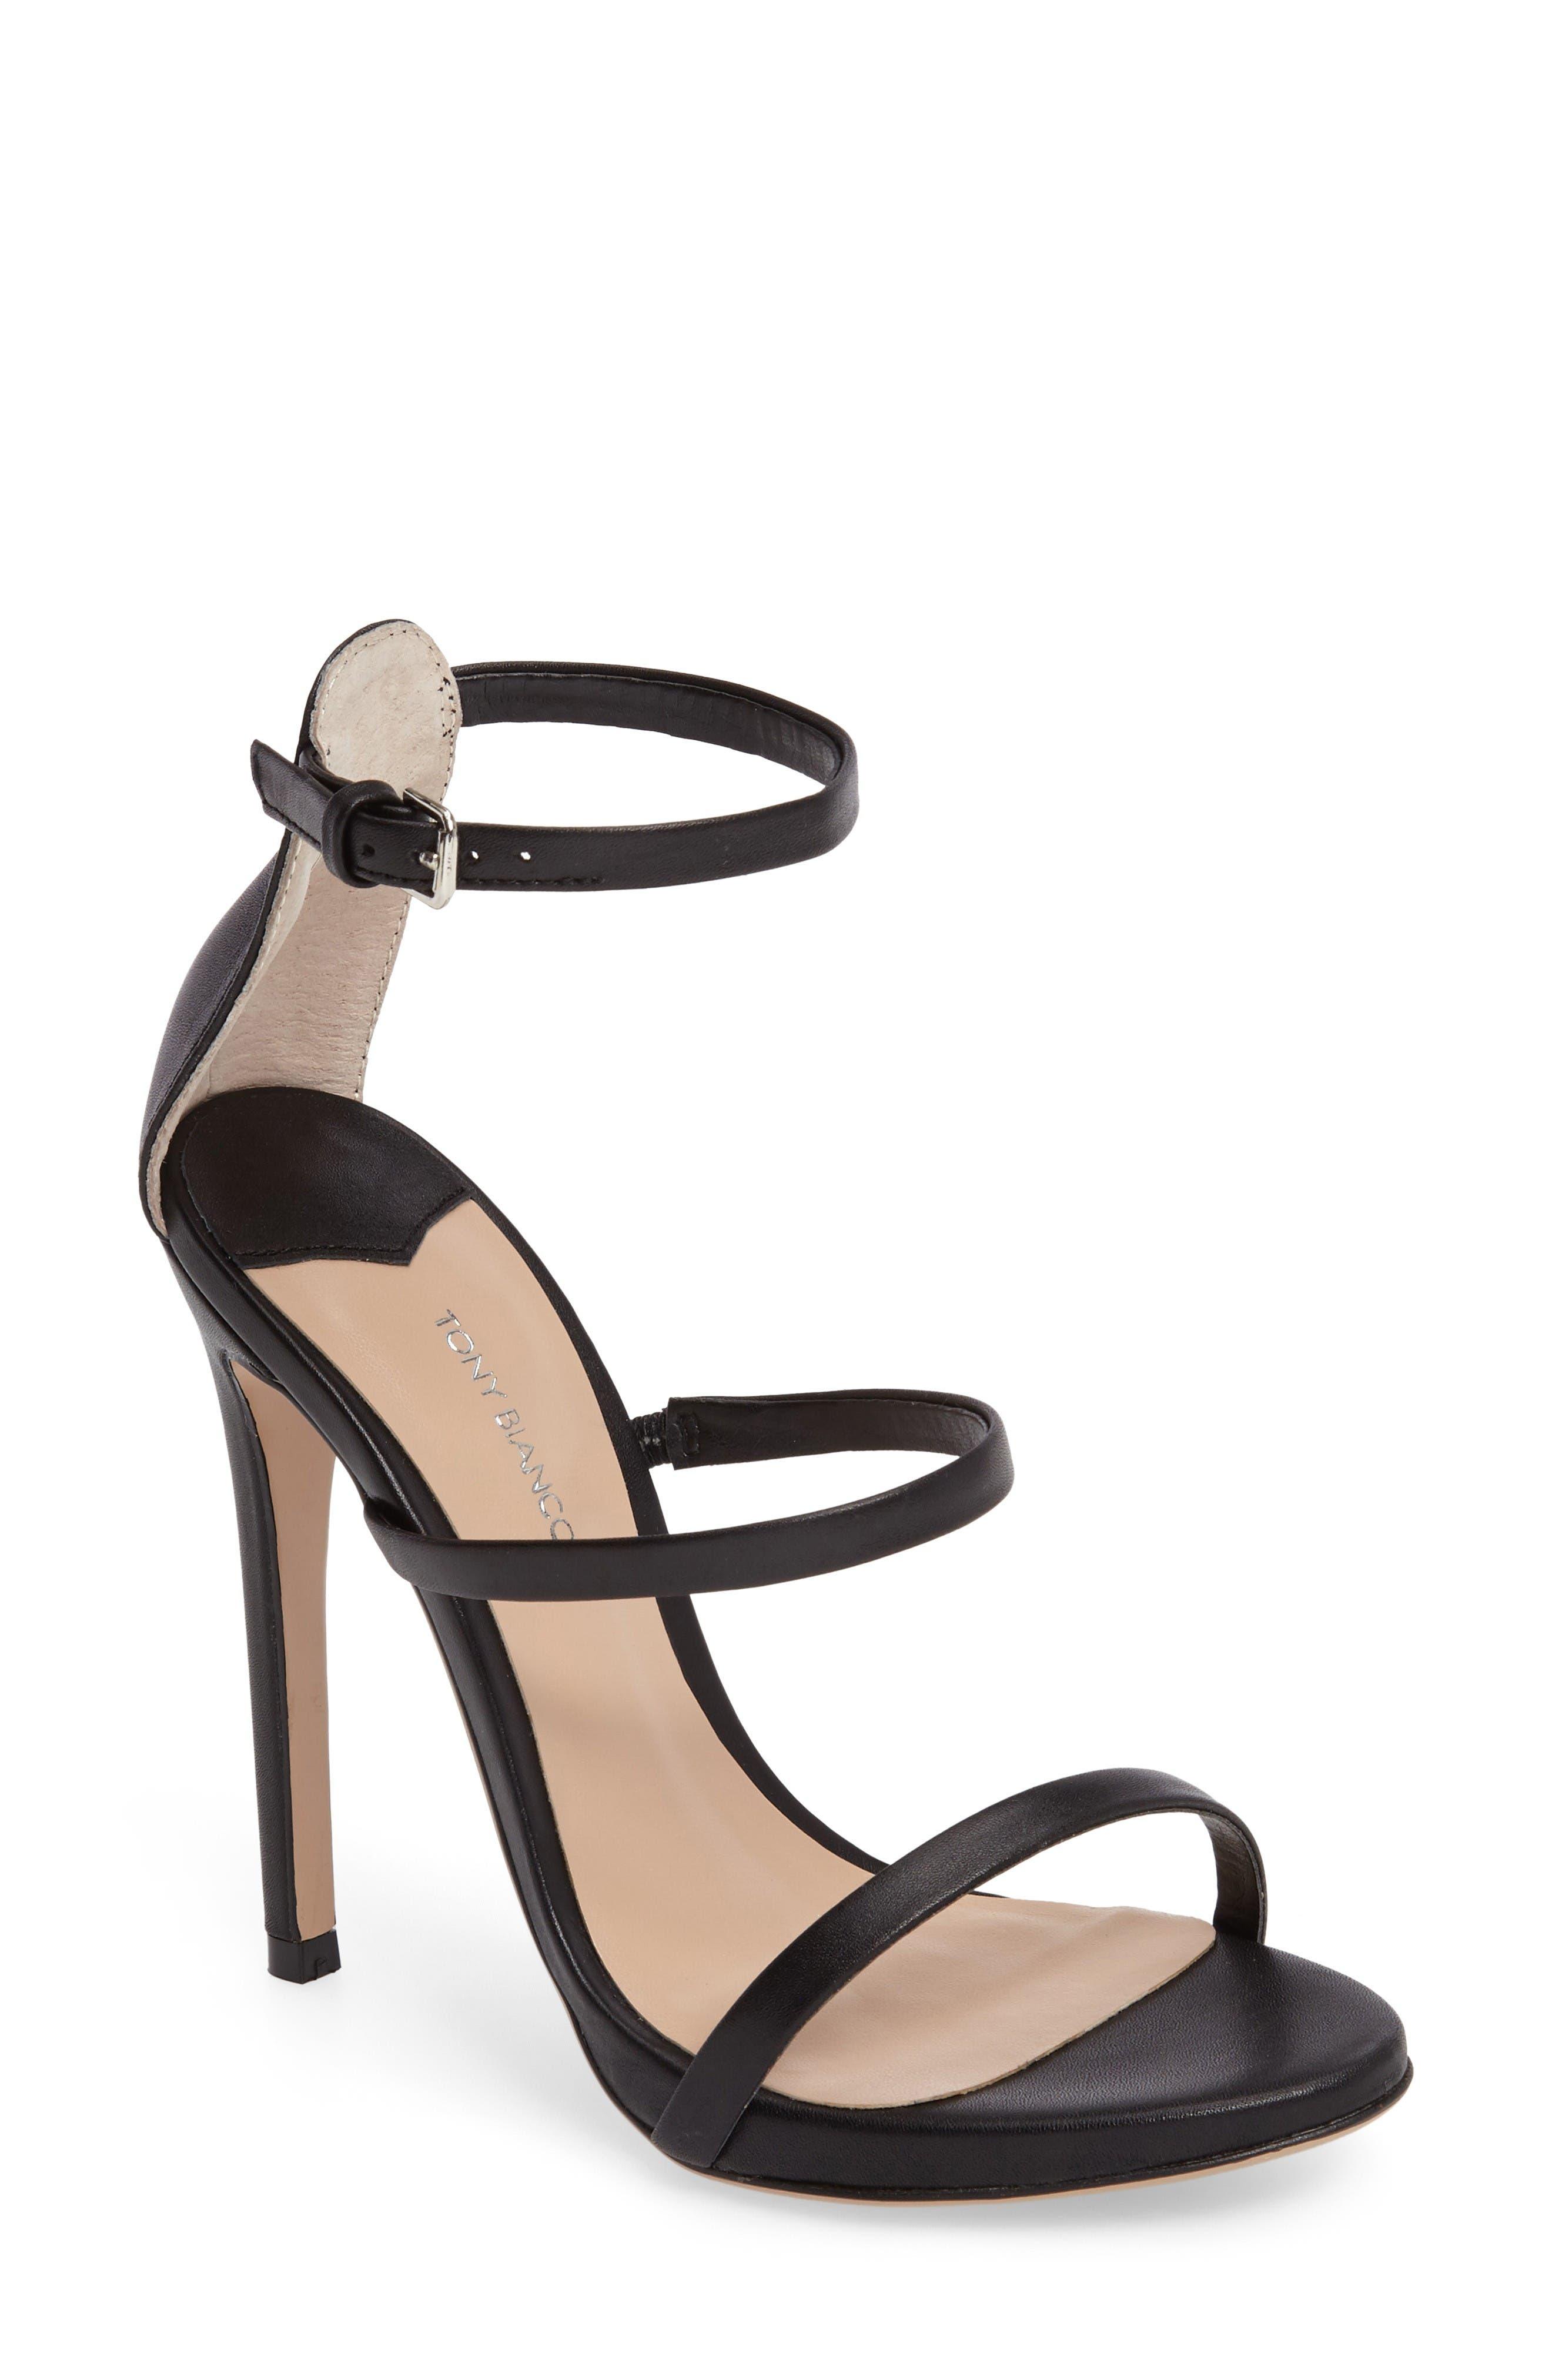 Atkins Sandal,                         Main,                         color, Black Capretto Leather